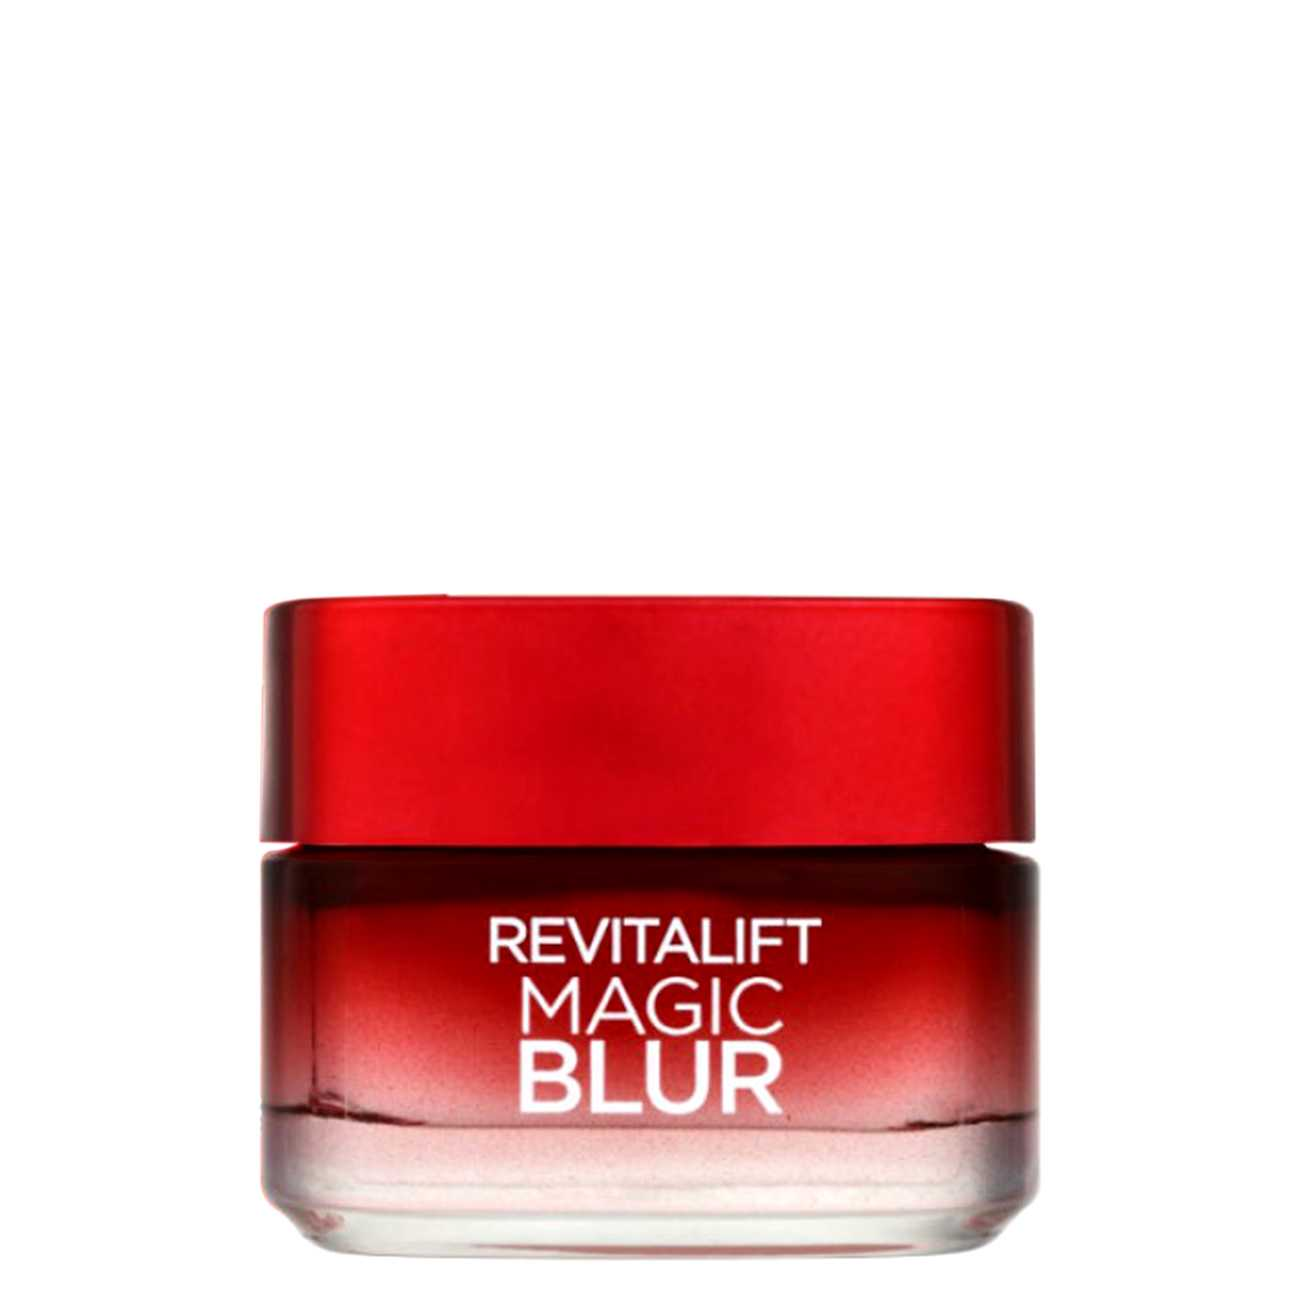 Revitalift Magic Blur 50 Ml L'Oreal imagine 2021 bestvalue.eu